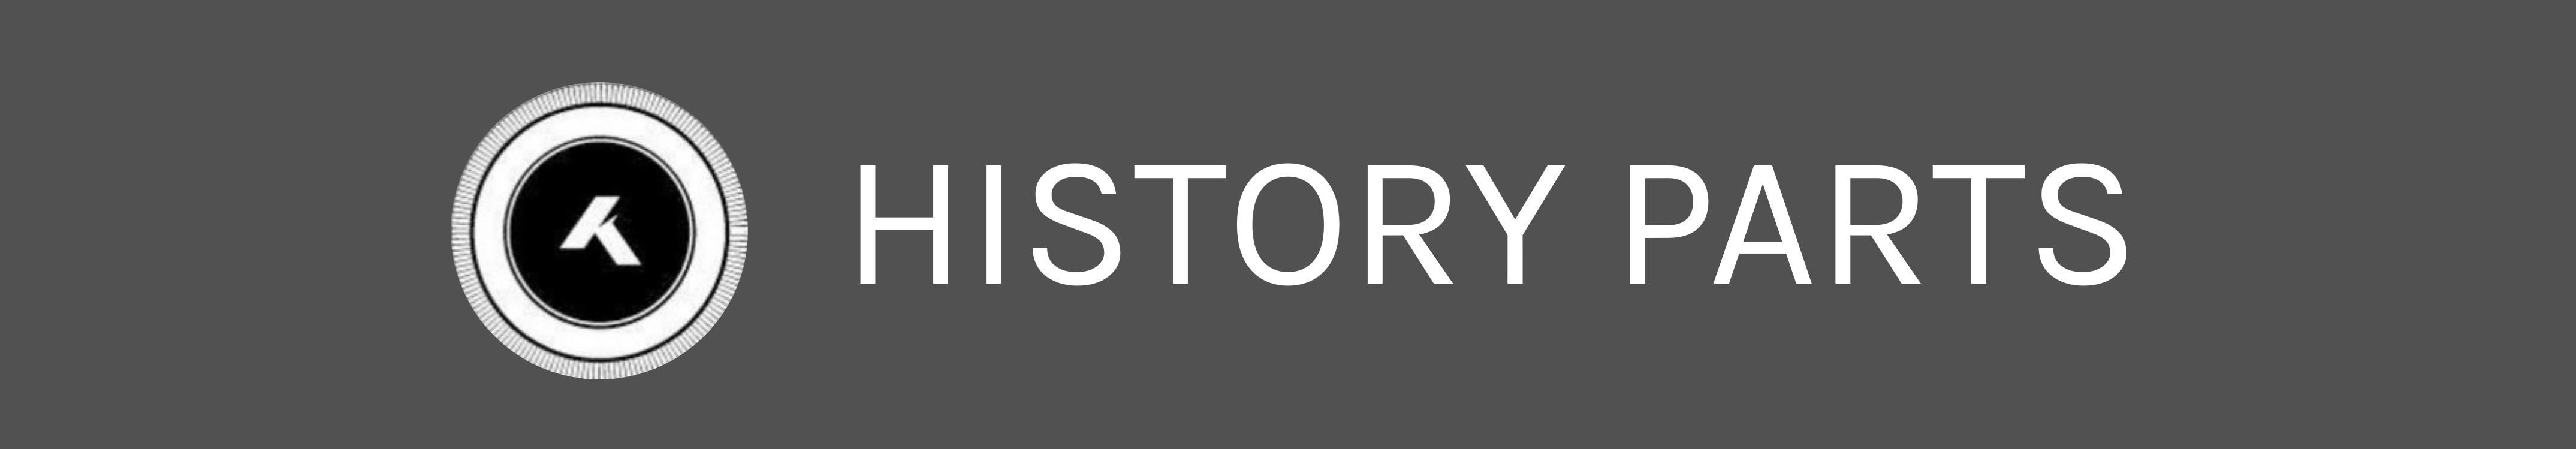 KHE-Banner-History-partsZi4V4gHWY7nfM